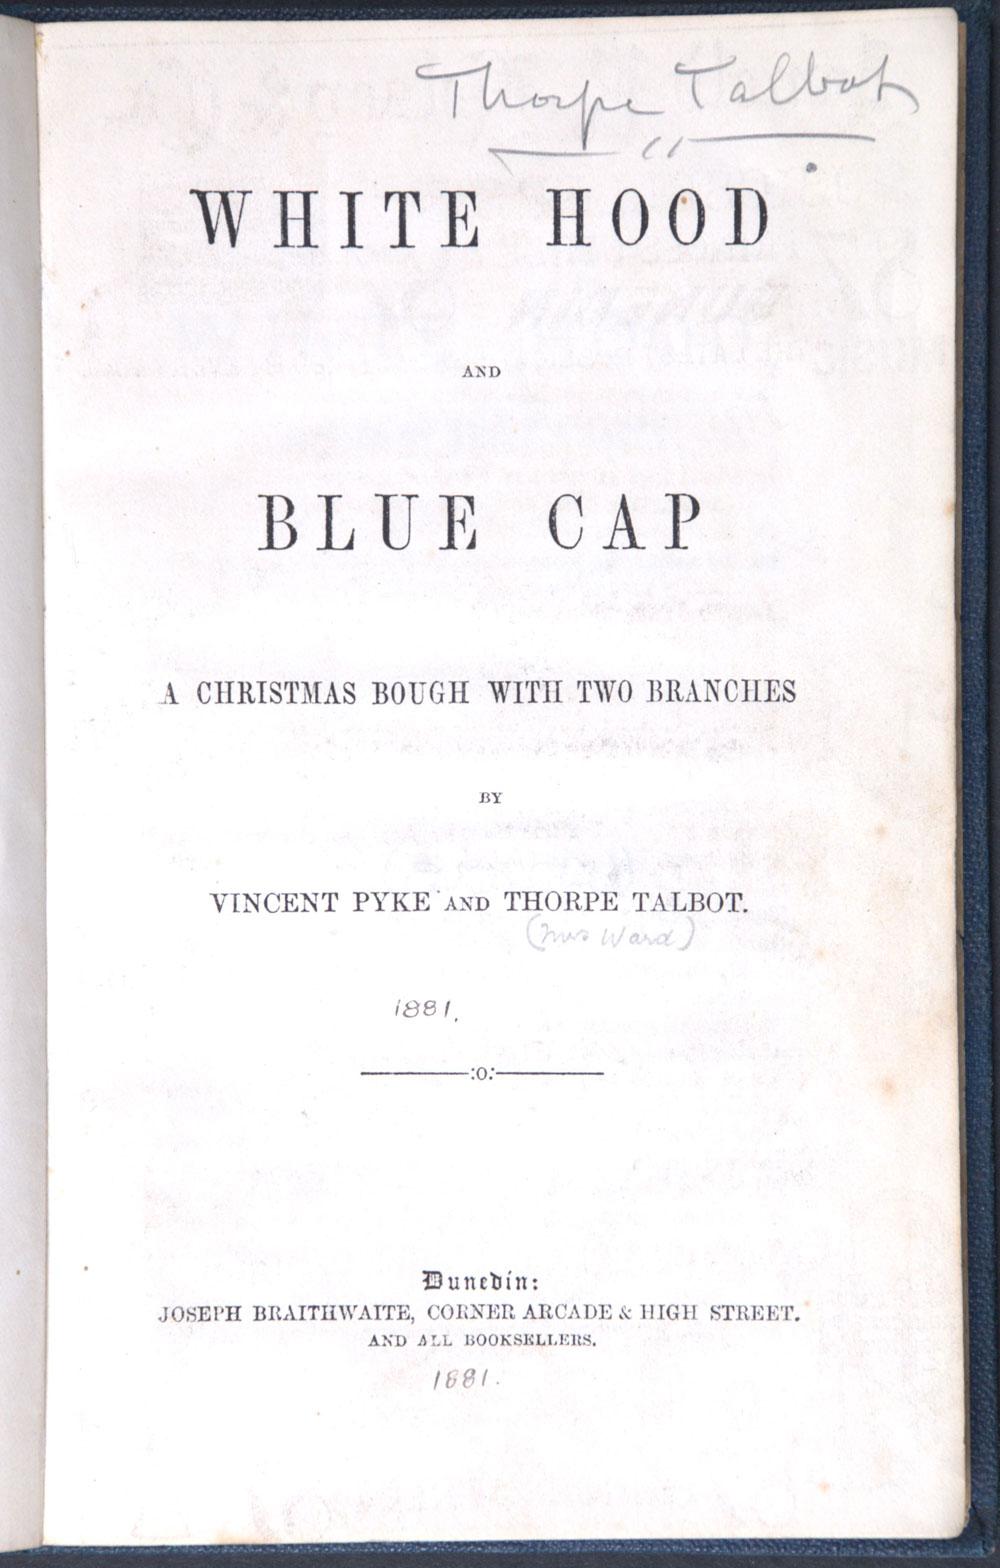 Vincent Pyke and Thorpe Talbot. <em>White hood, and, Blue cap</em>. Dunedin: Joseph Braithwaite, [1881]